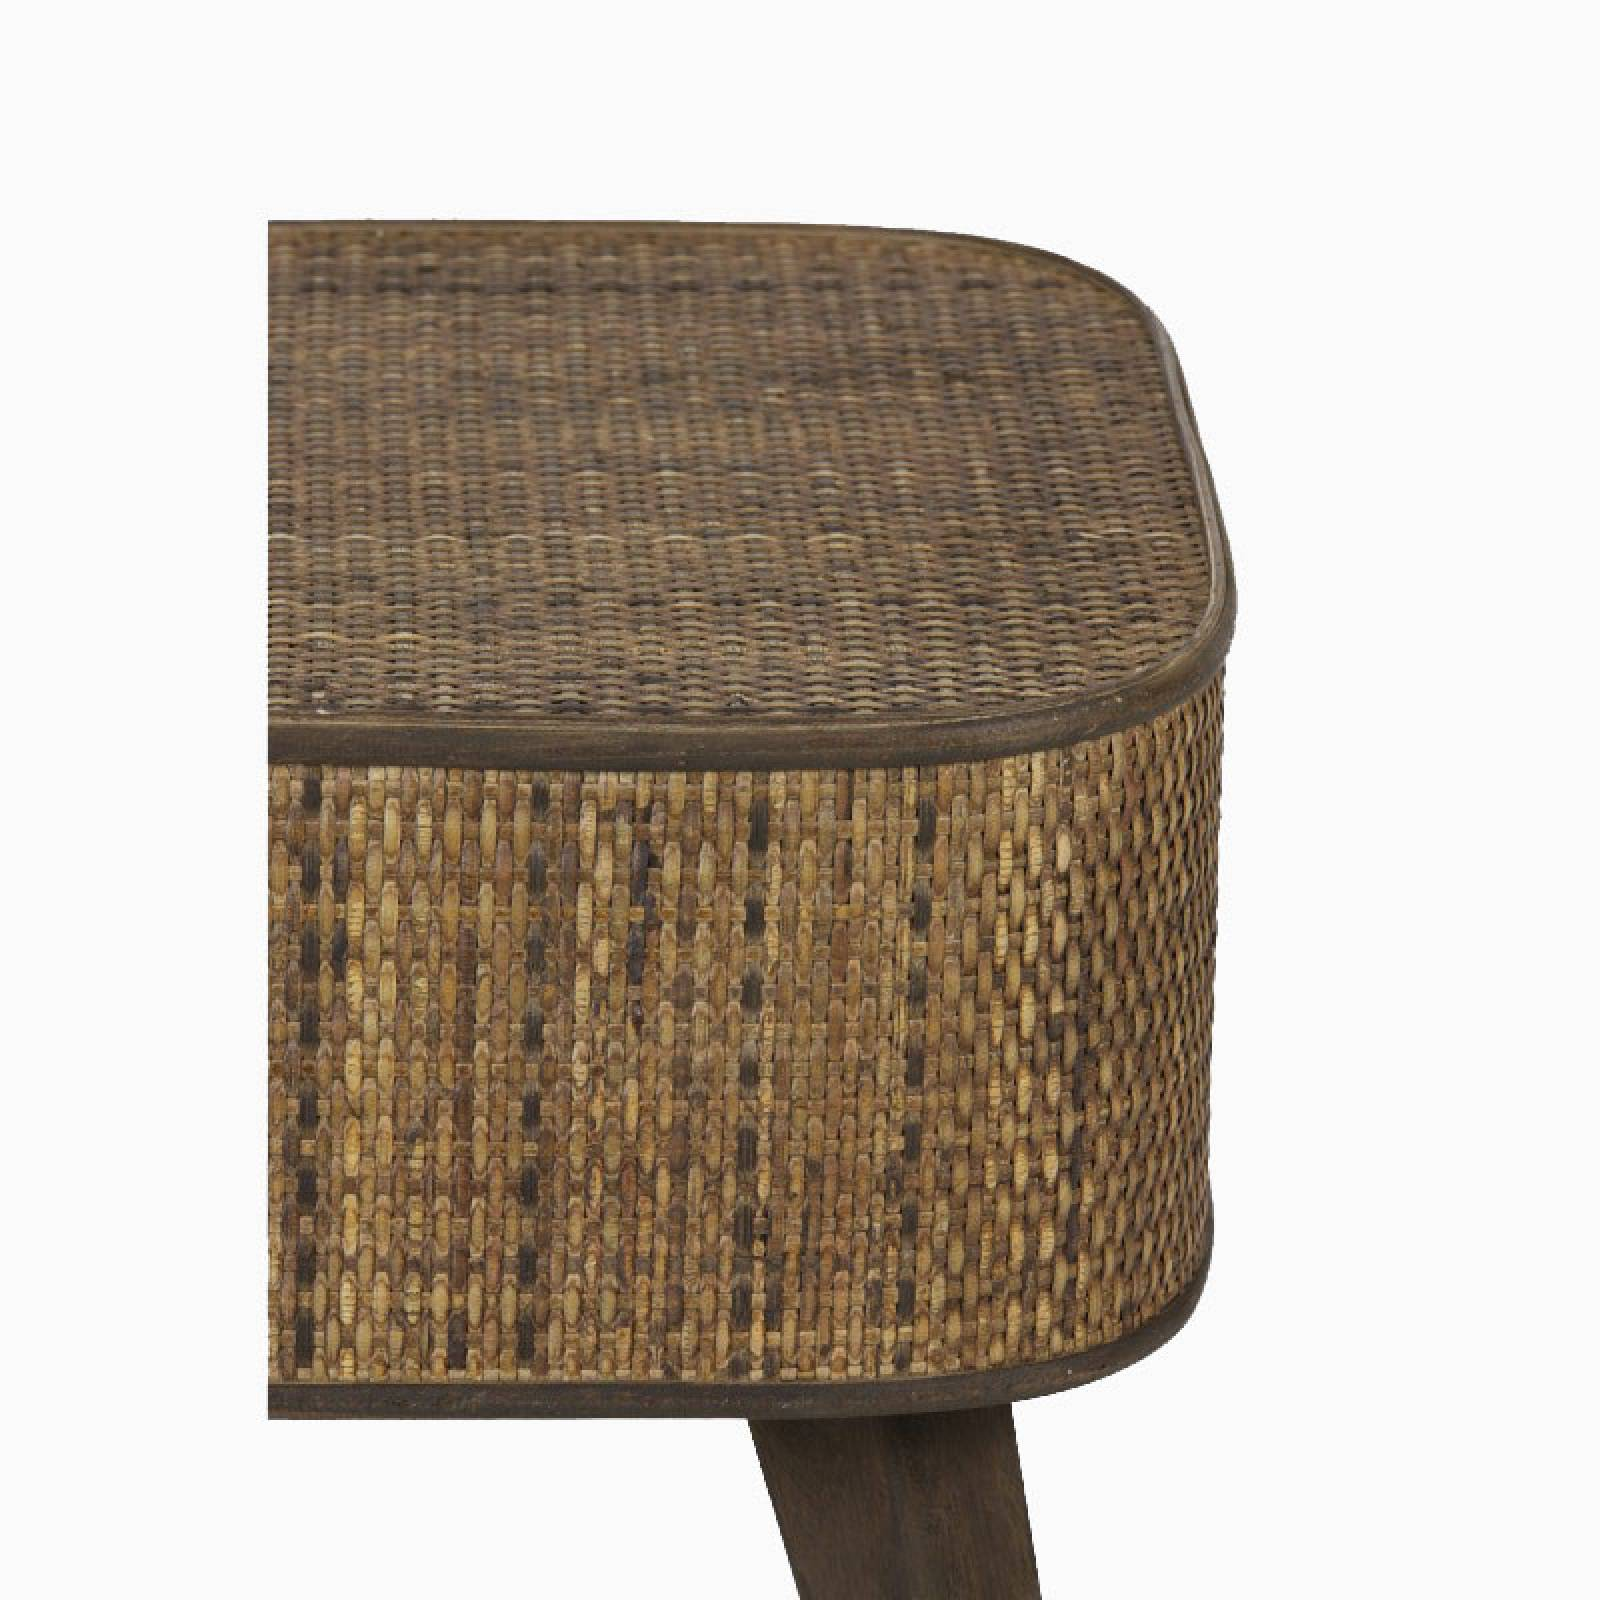 Canya Rectangular Woven Cane Side Table In Dark thumbnails